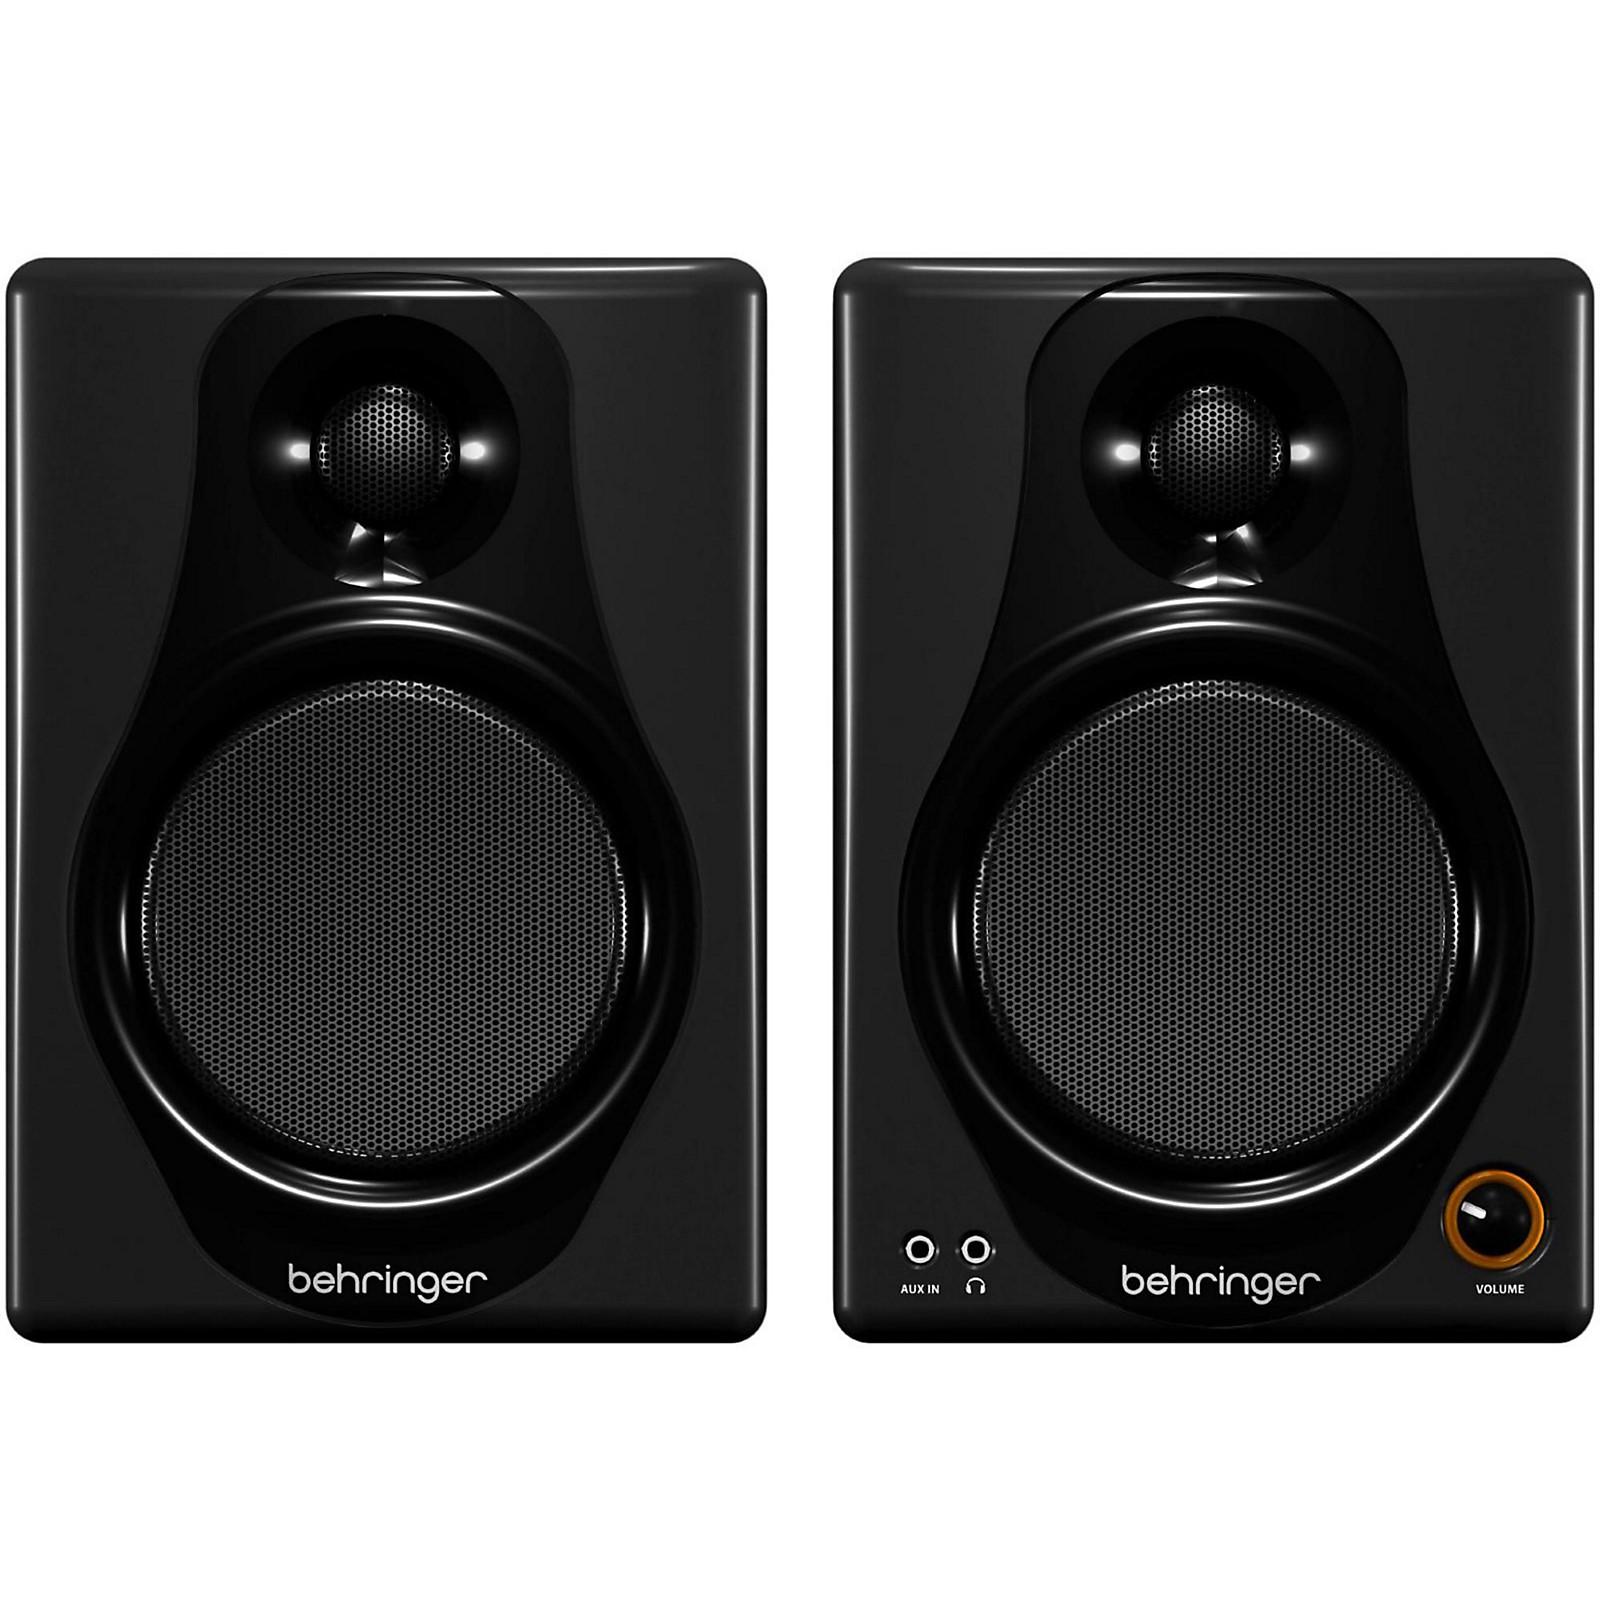 Open Box Behringer MEDIA 40USB High-Resolution,150-Watt Bi-Amped Digital Monitor Speakers with USB Input